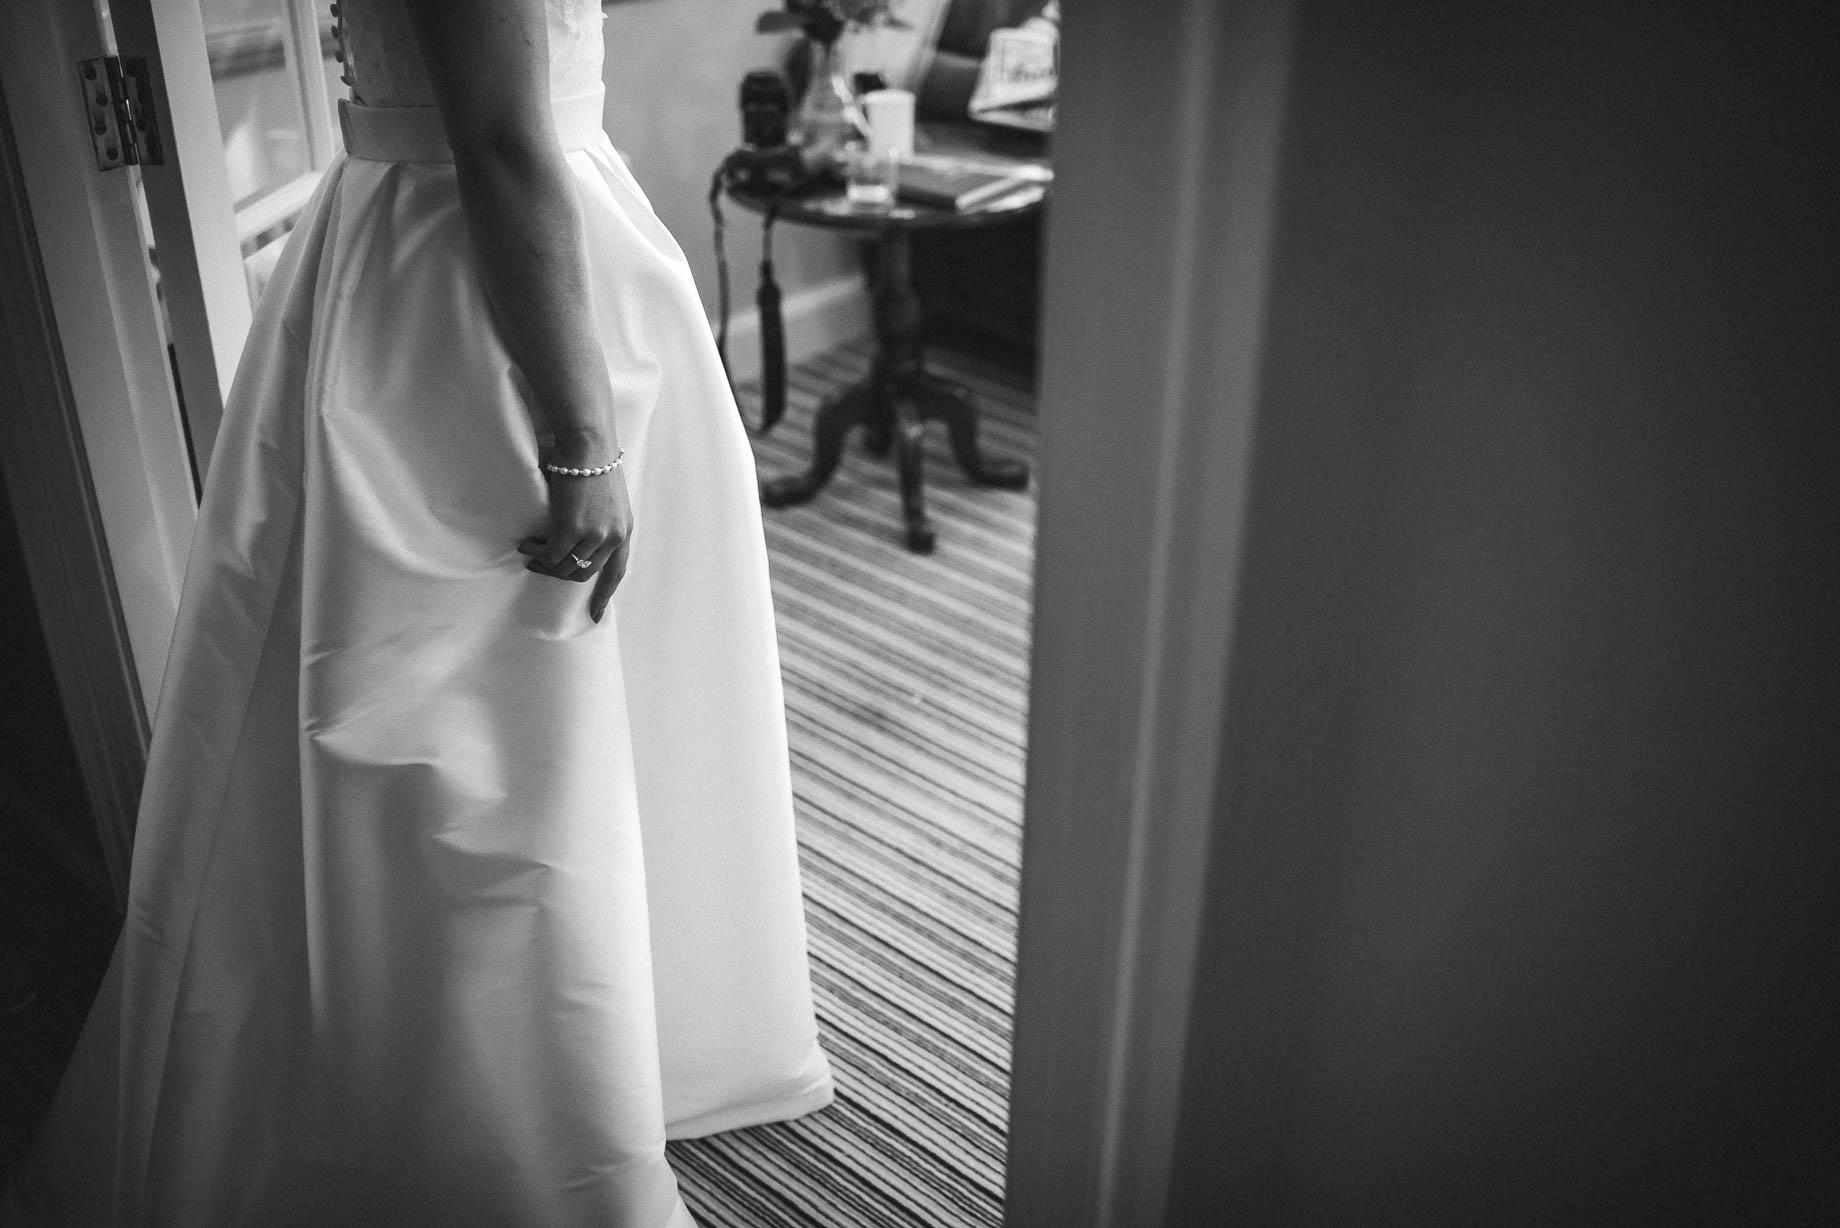 Surrey wedding photography in Epsom - Chloe and Seb